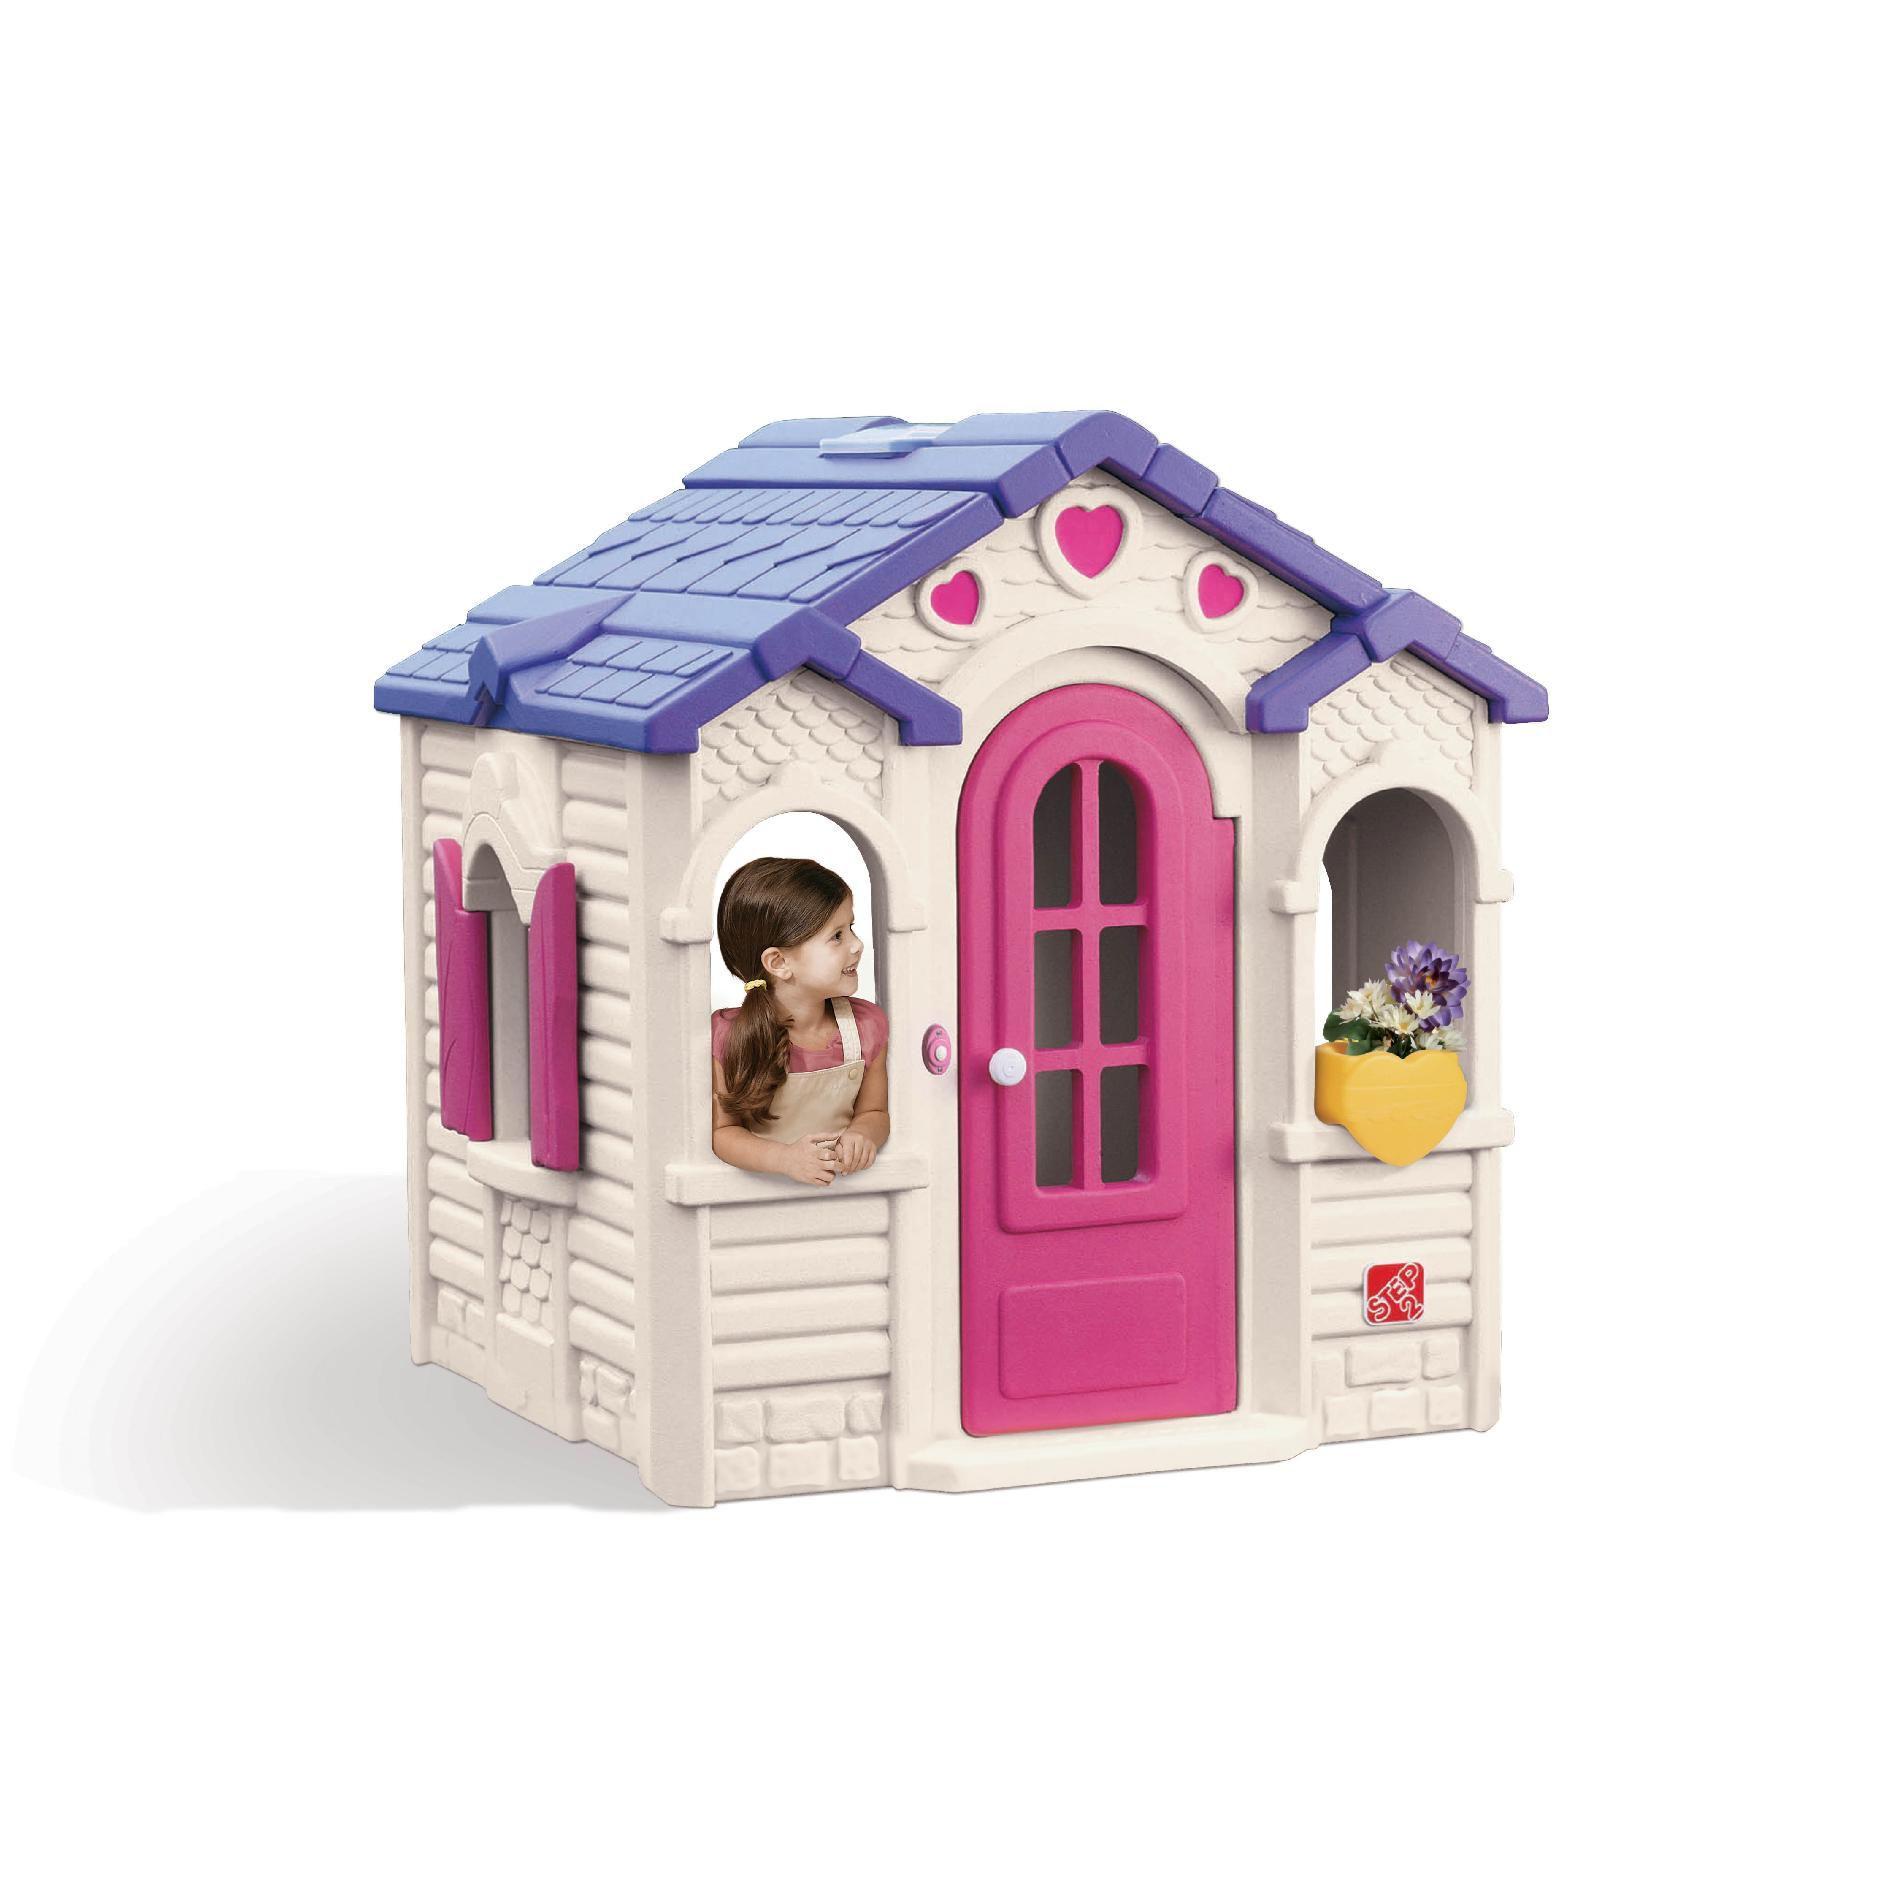 Sweetheart Playhouse Kmart For My Princess